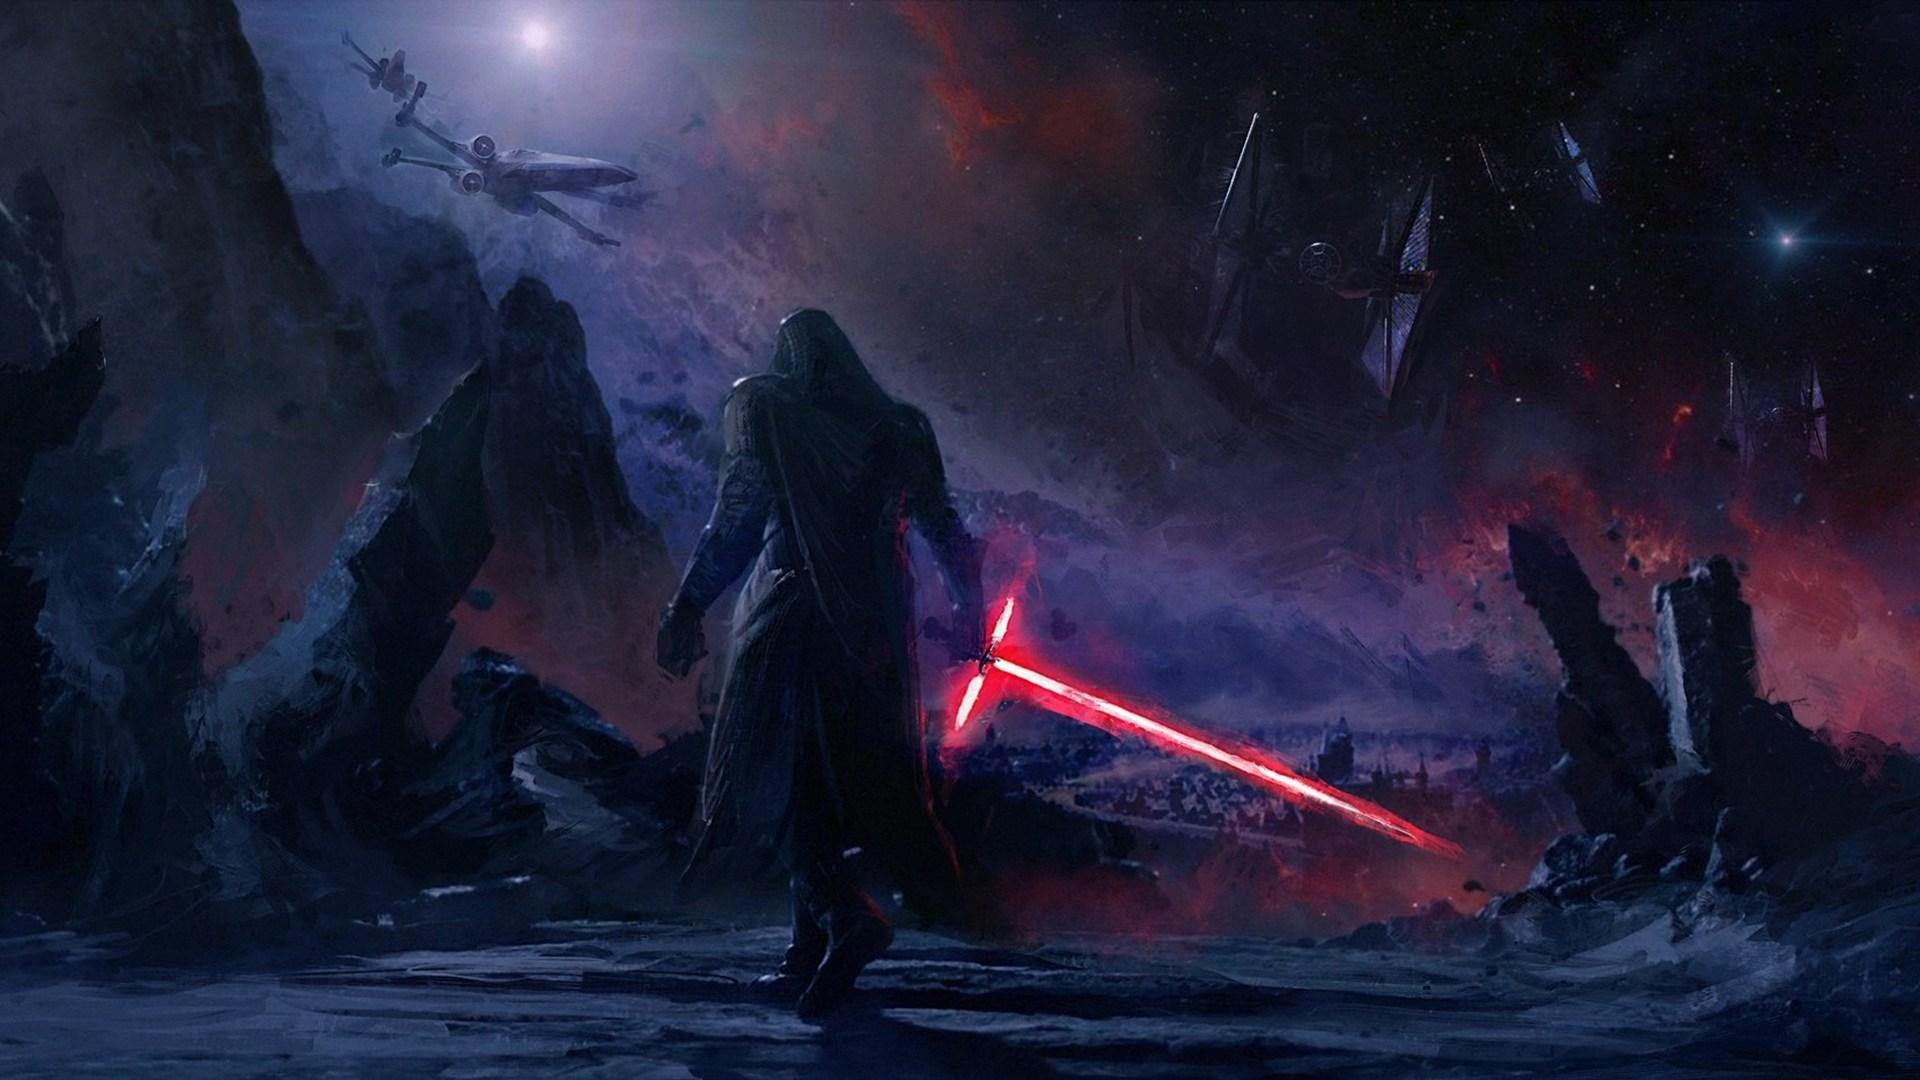 Hd Star Wars Wallpaper Hd Top 20 Yoda Wallpapers Hd